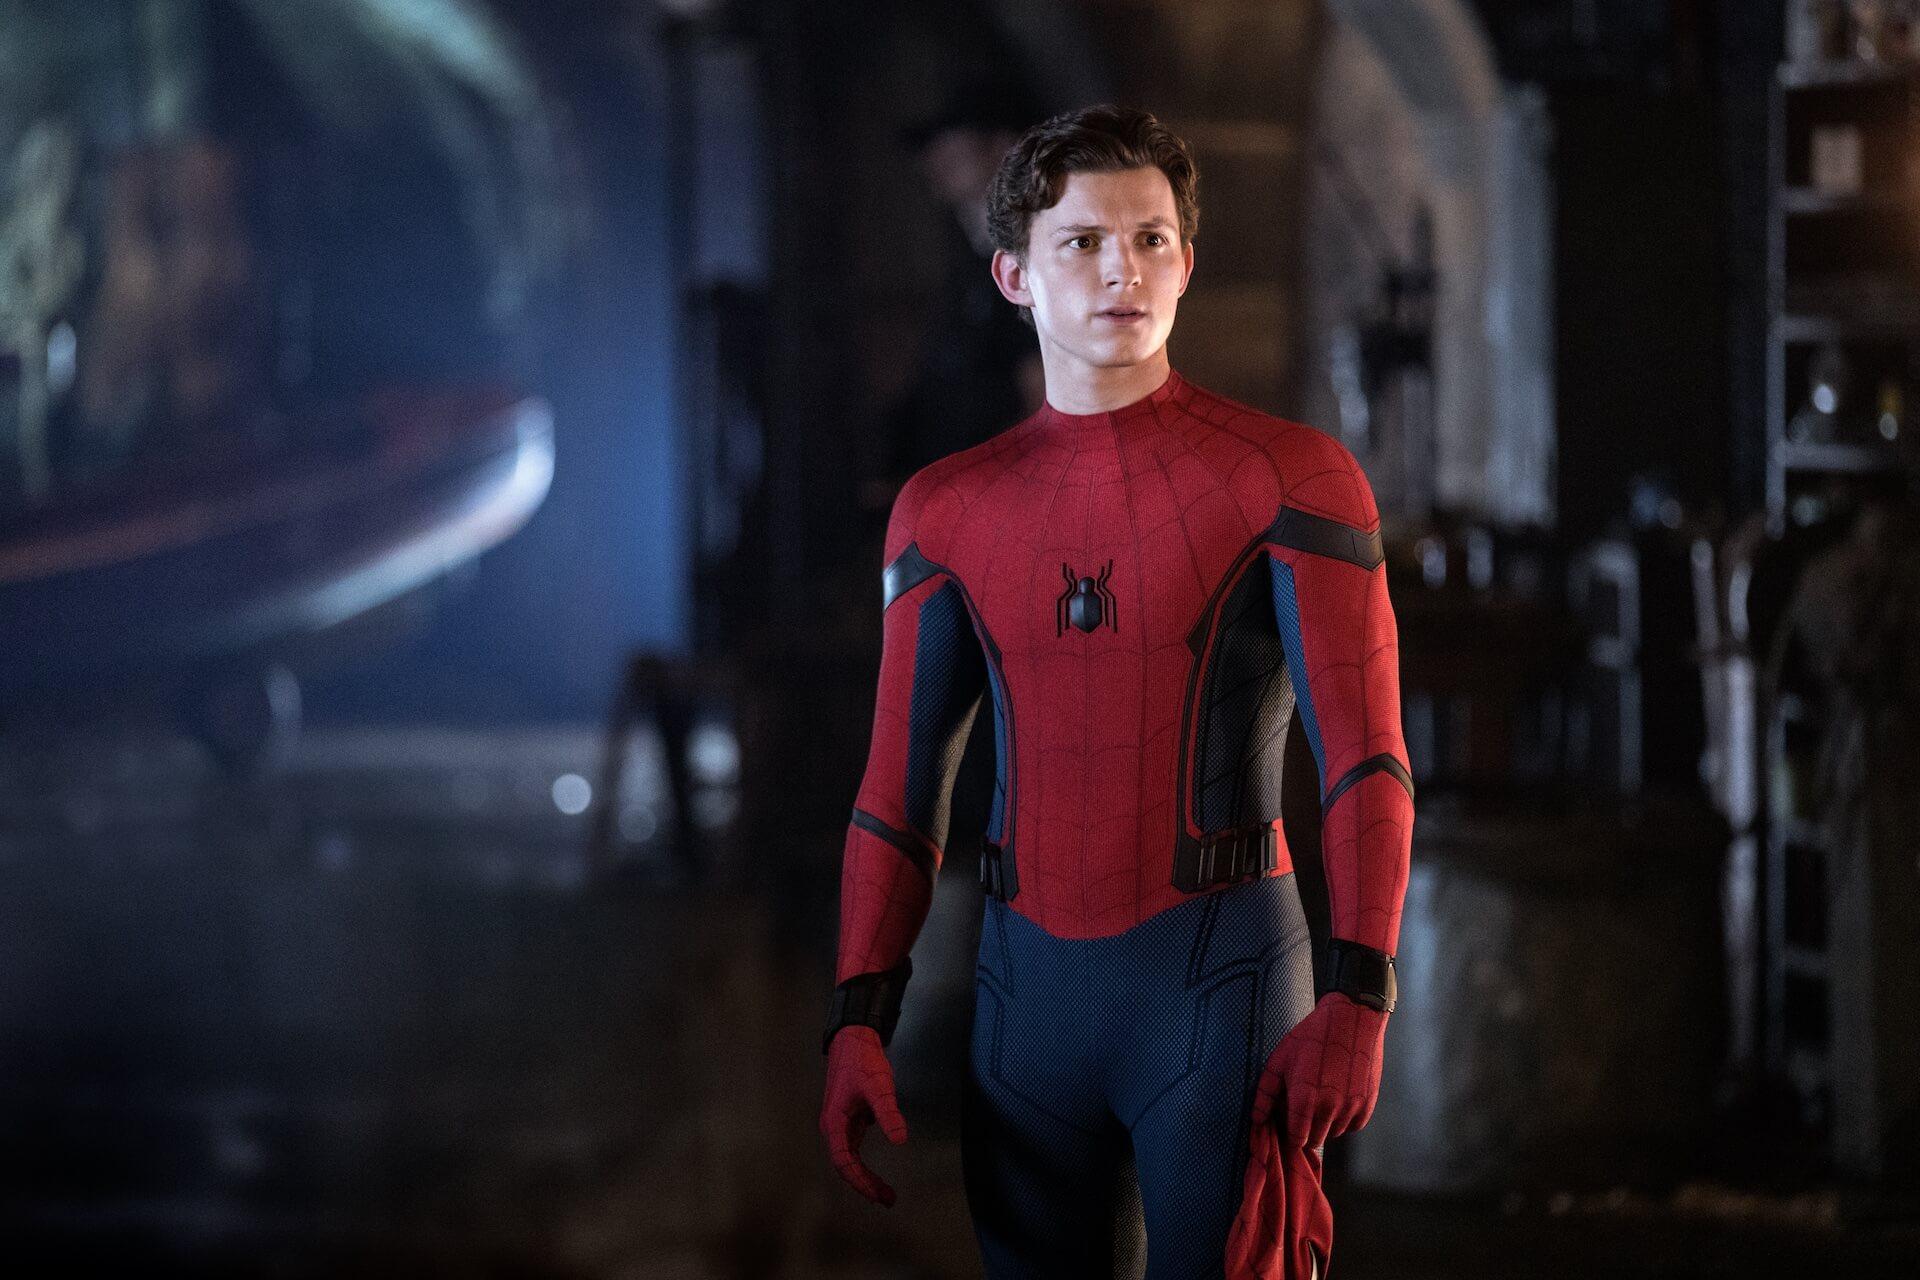 NetflixにMCU『スパイダーマン』が登場!『ファースト・マン』『マスカレード・ホテル』など5月のラインナップが一挙解禁 art210423_netflix_may_1